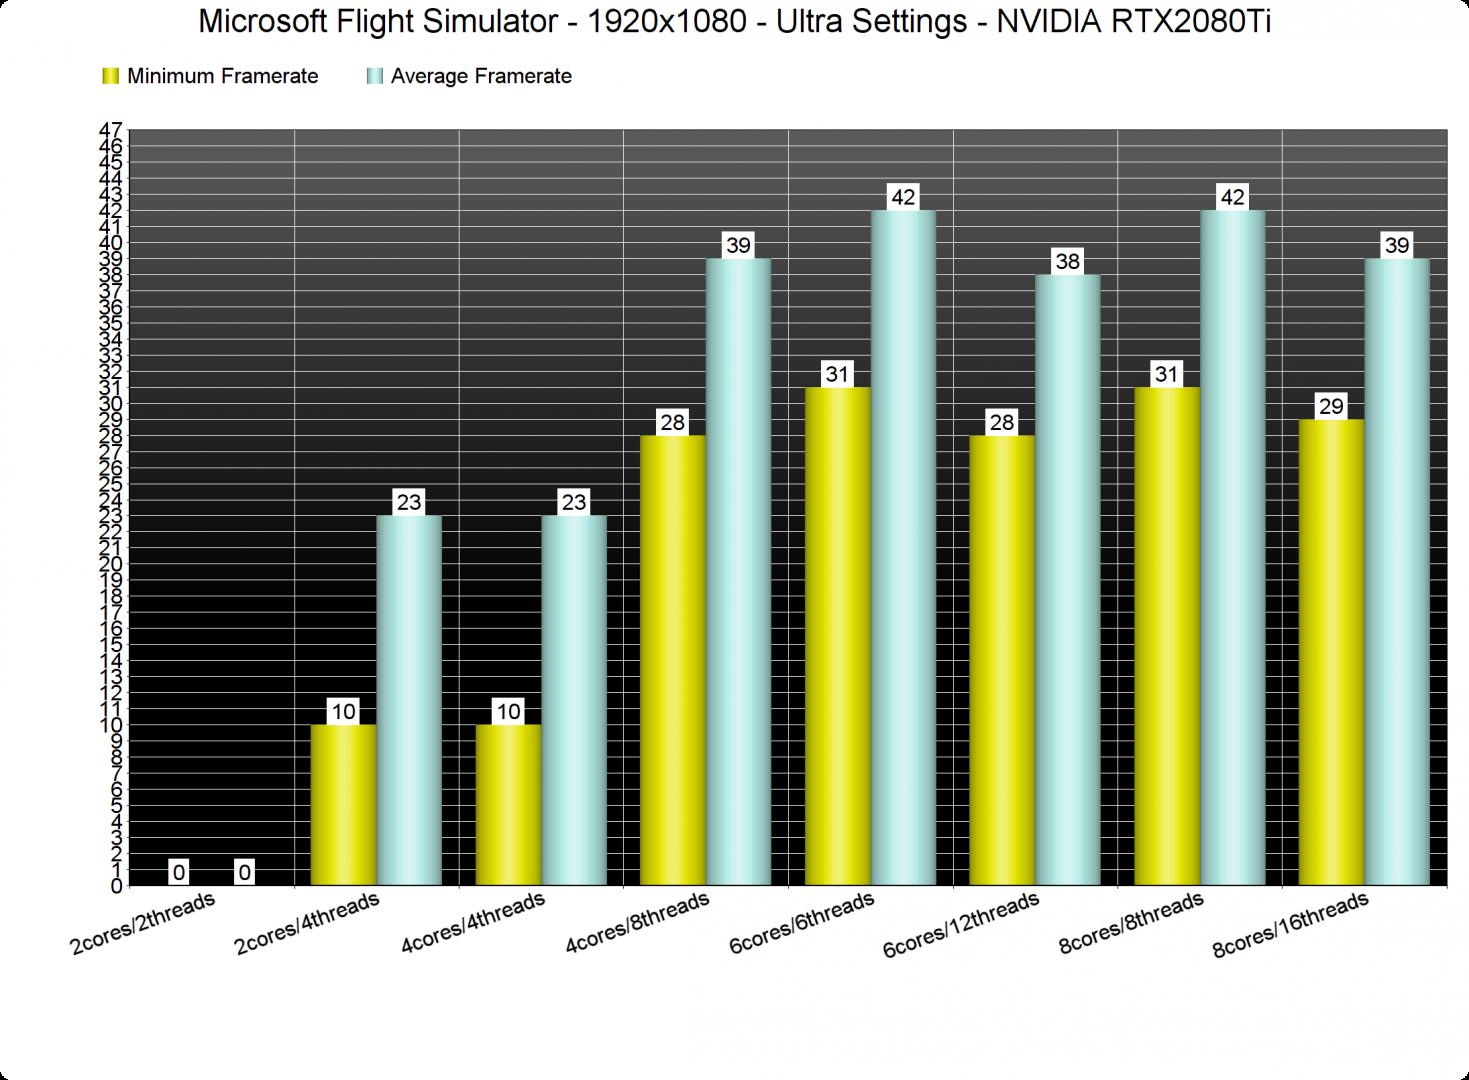 Microsoft Flight Simulator CPU benchmarks